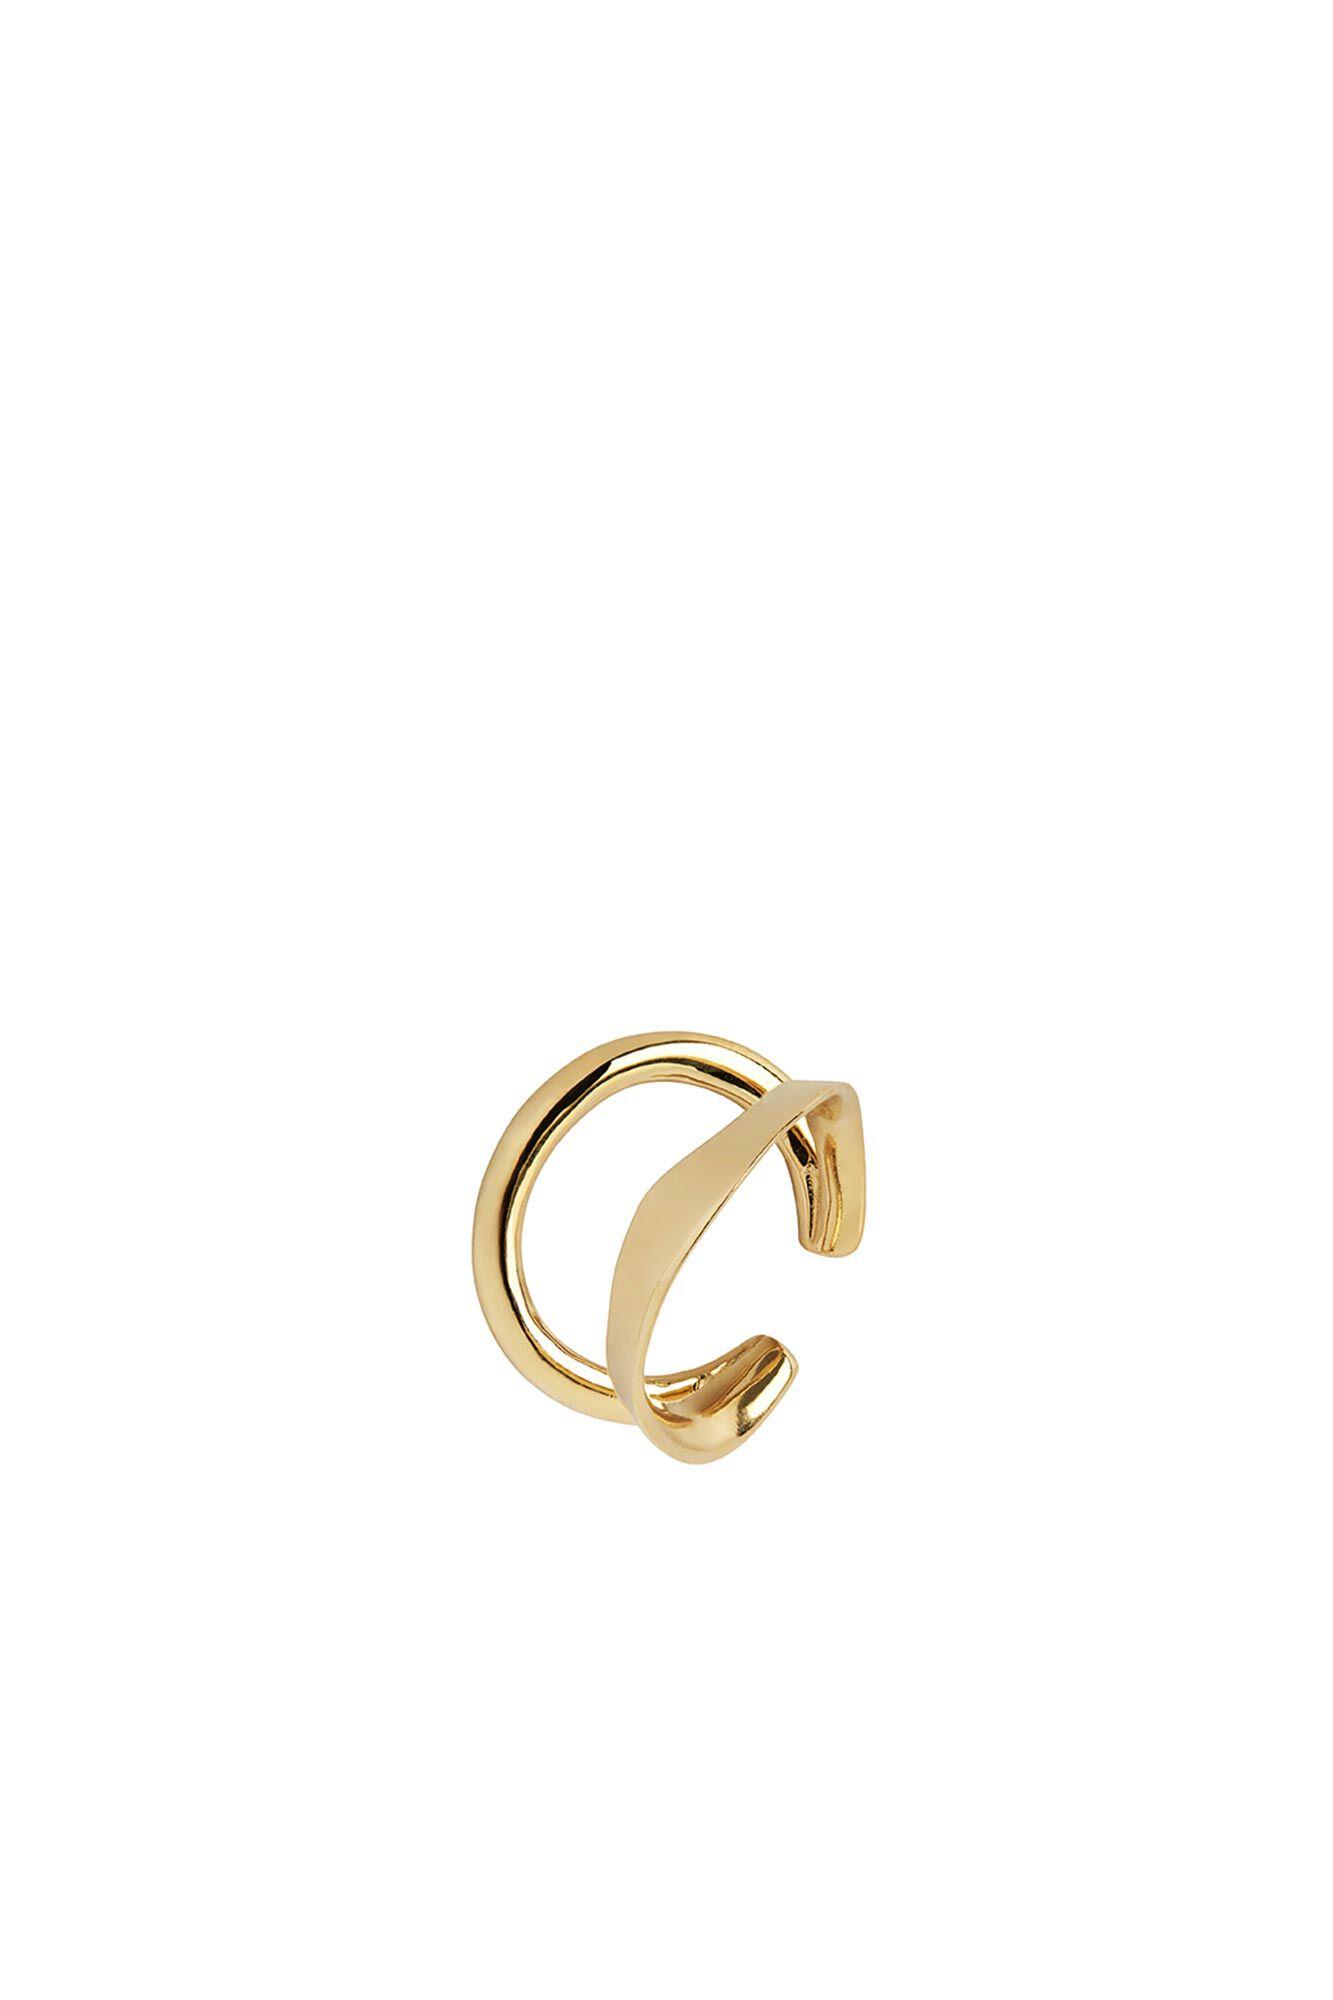 Ripples earcuff 200133YG, GOLD HP